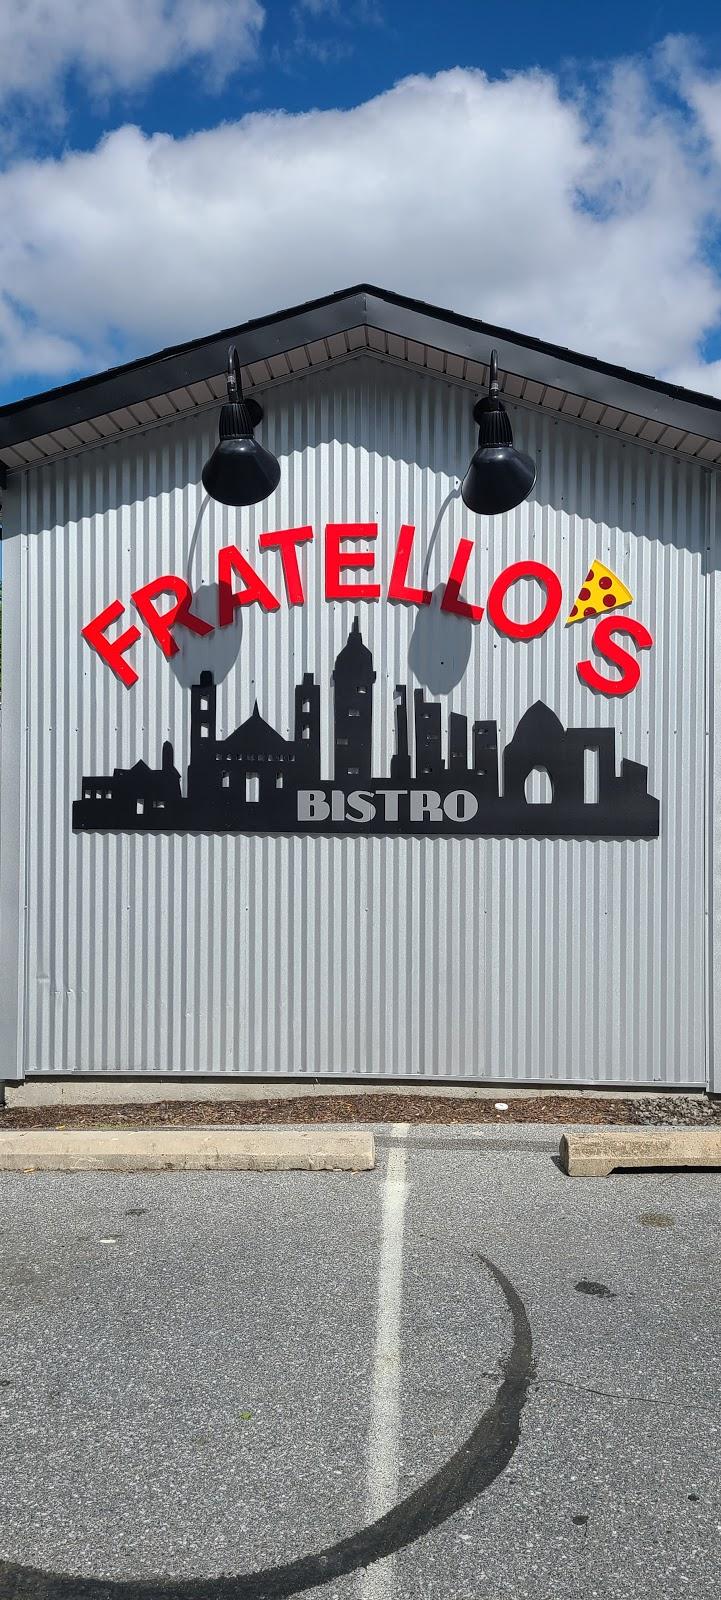 Fratellos   restaurant   420 Nichols St, Pottsville, PA 17901, USA   5707282181 OR +1 570-728-2181